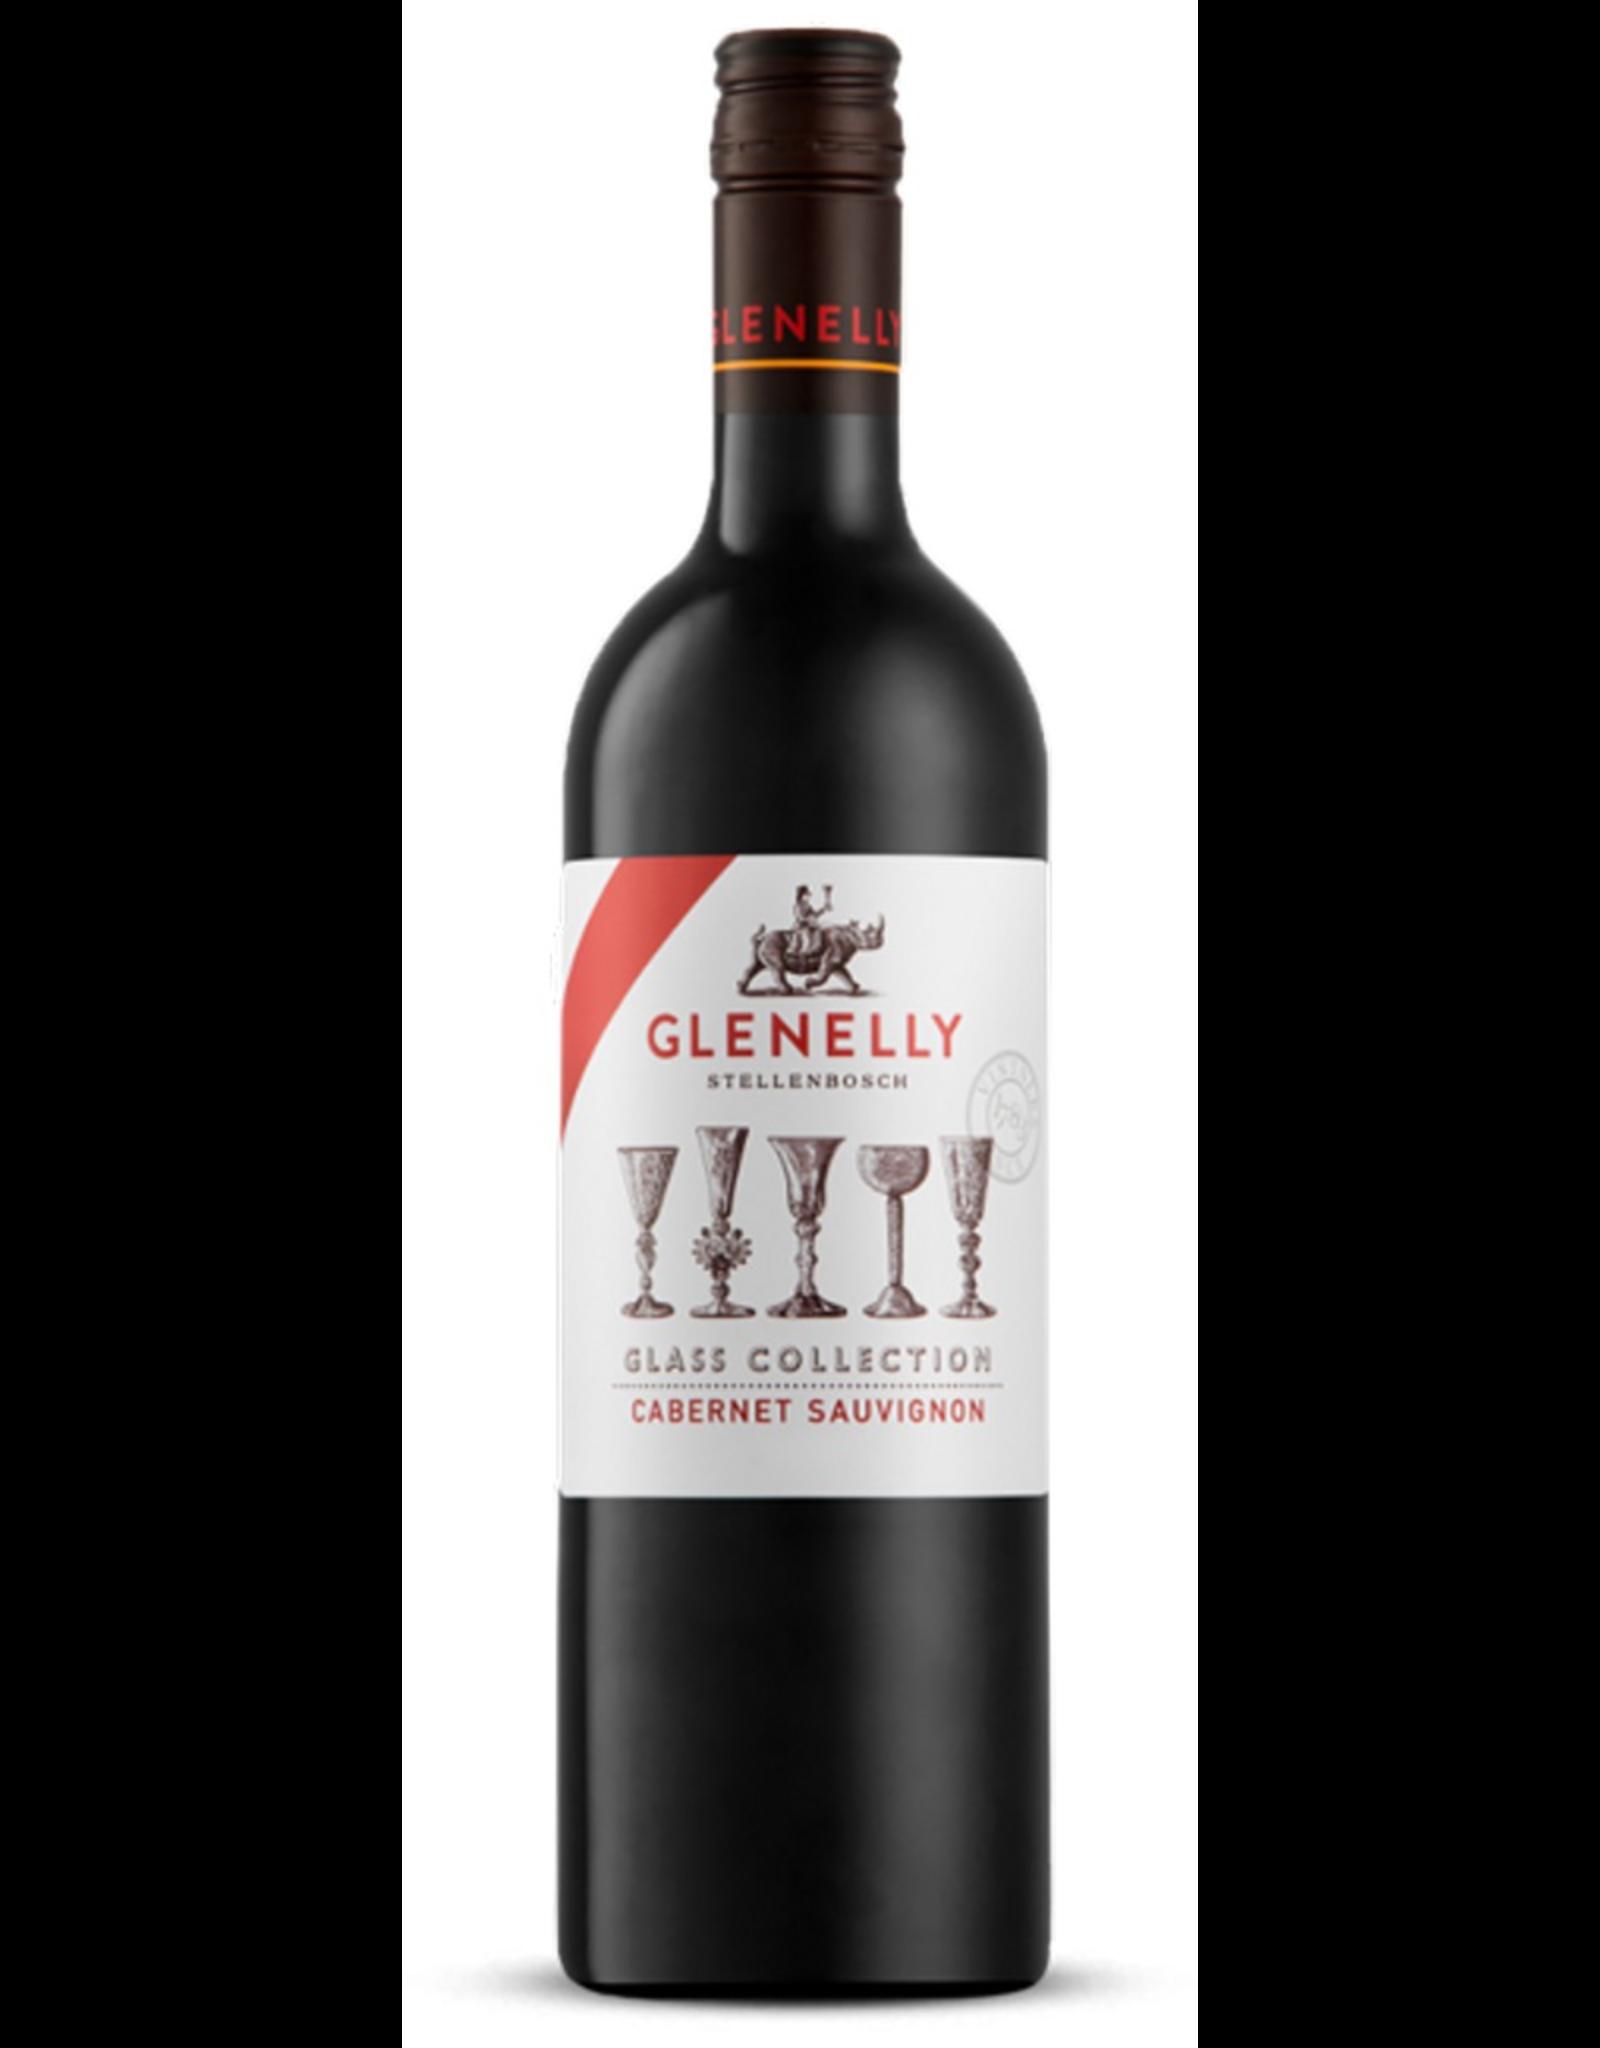 Red Wine 2018, Glenelly Glass Collection, Cabernet Sauvignon, Stellenbosh, Coastal Region, South Africa, 14% Alc, CTnr